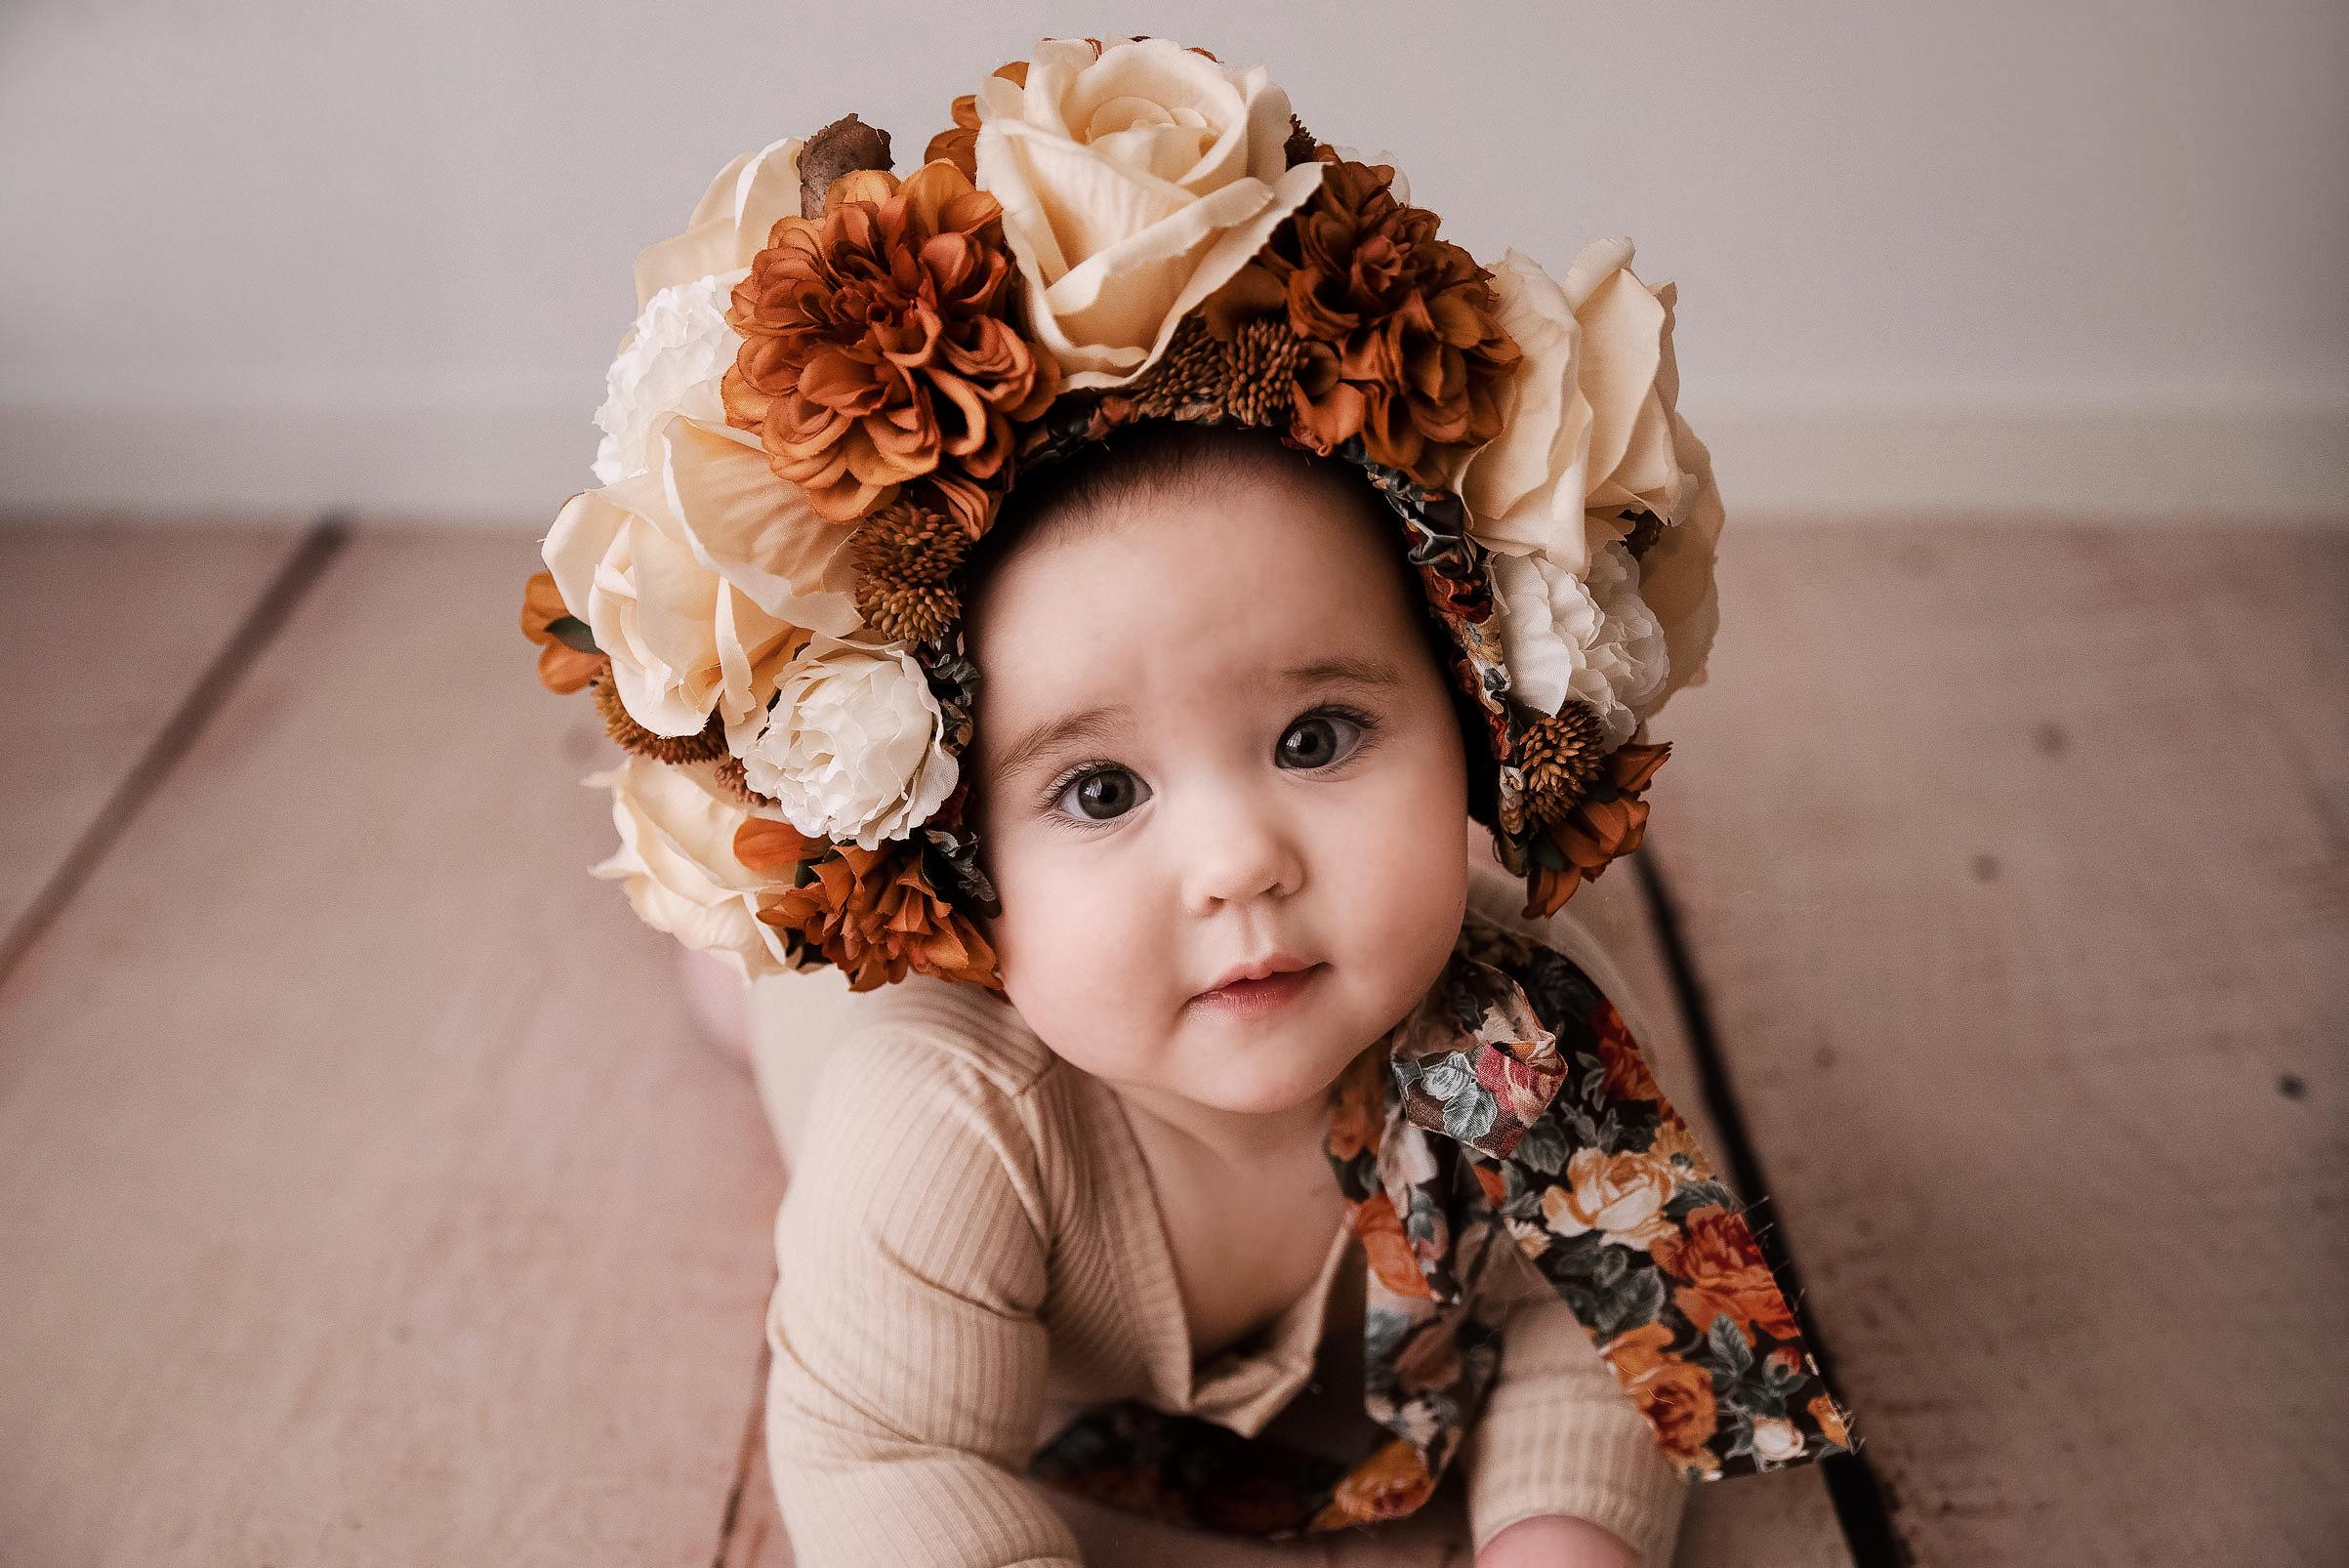 baby-photography-sydney-photo-shoot-2